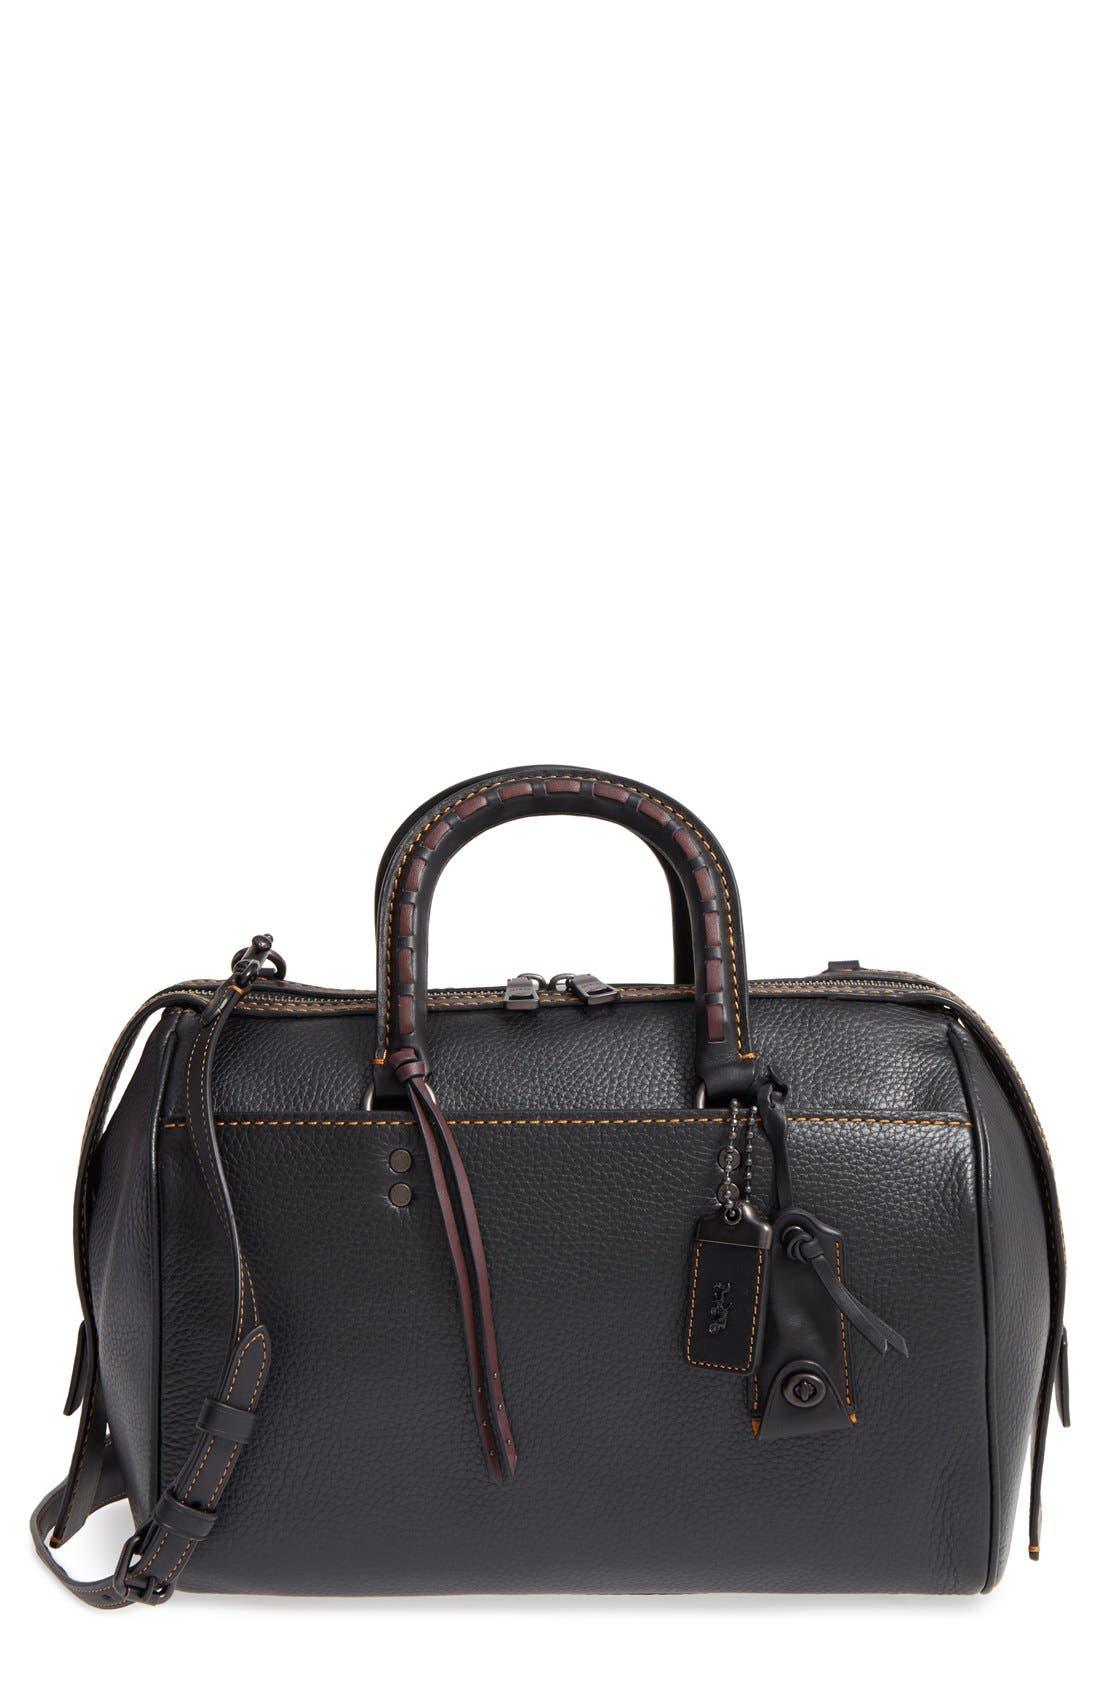 Rogue Leather Satchel,                         Main,                         color,